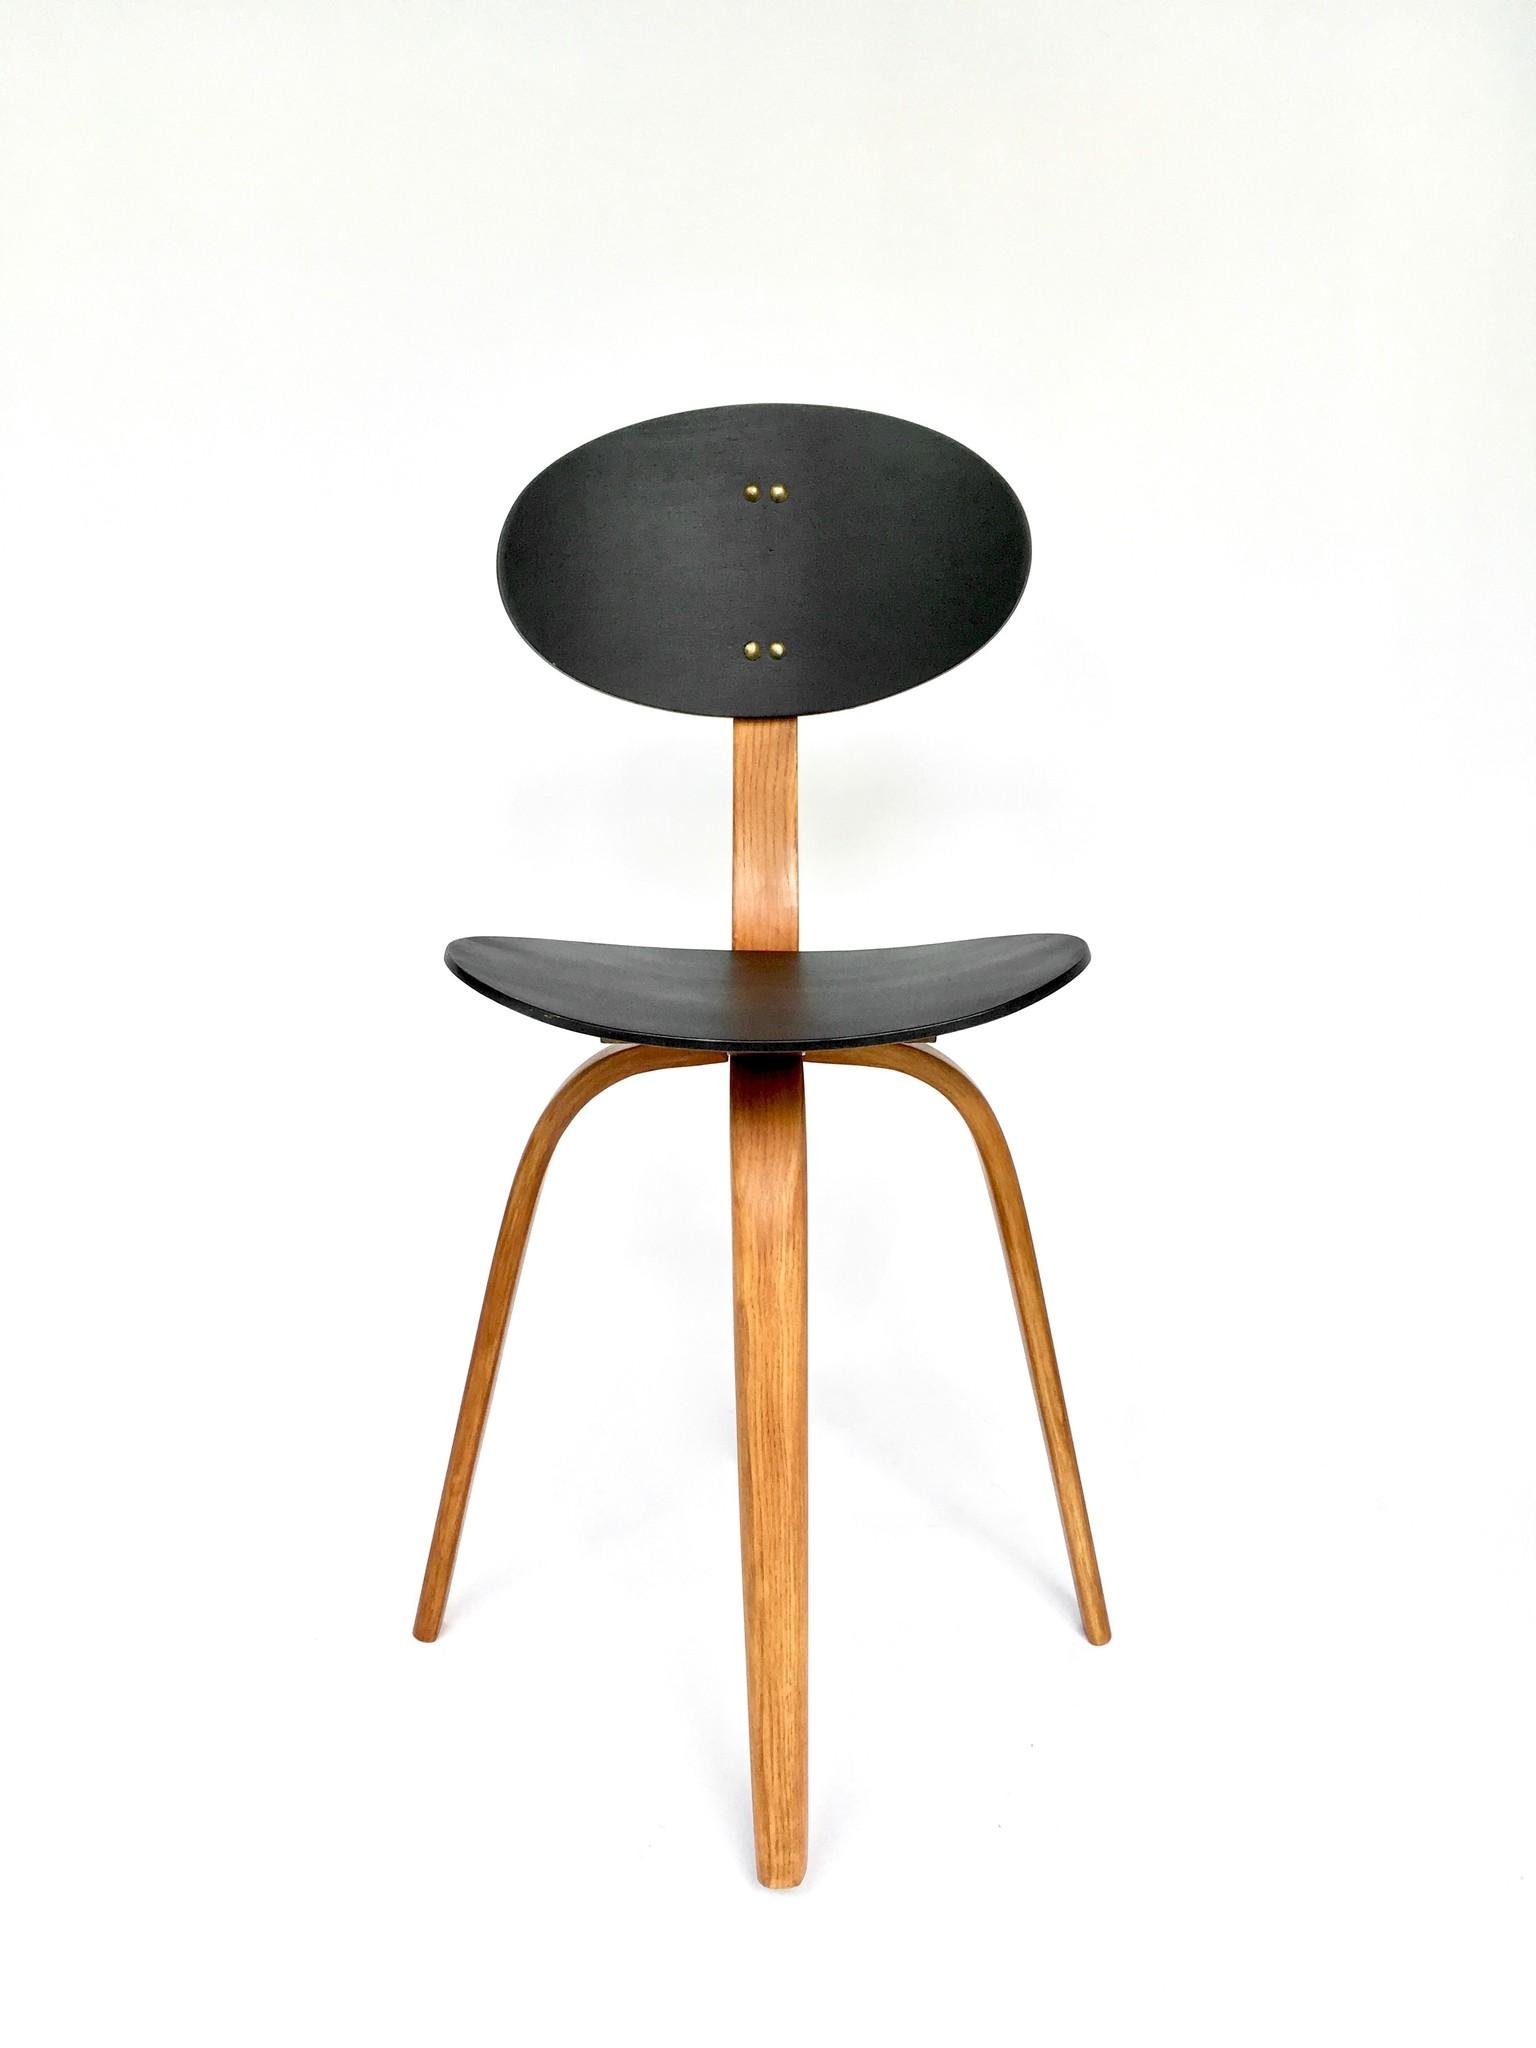 Hugues Steiner 'Bow-Wood' chair